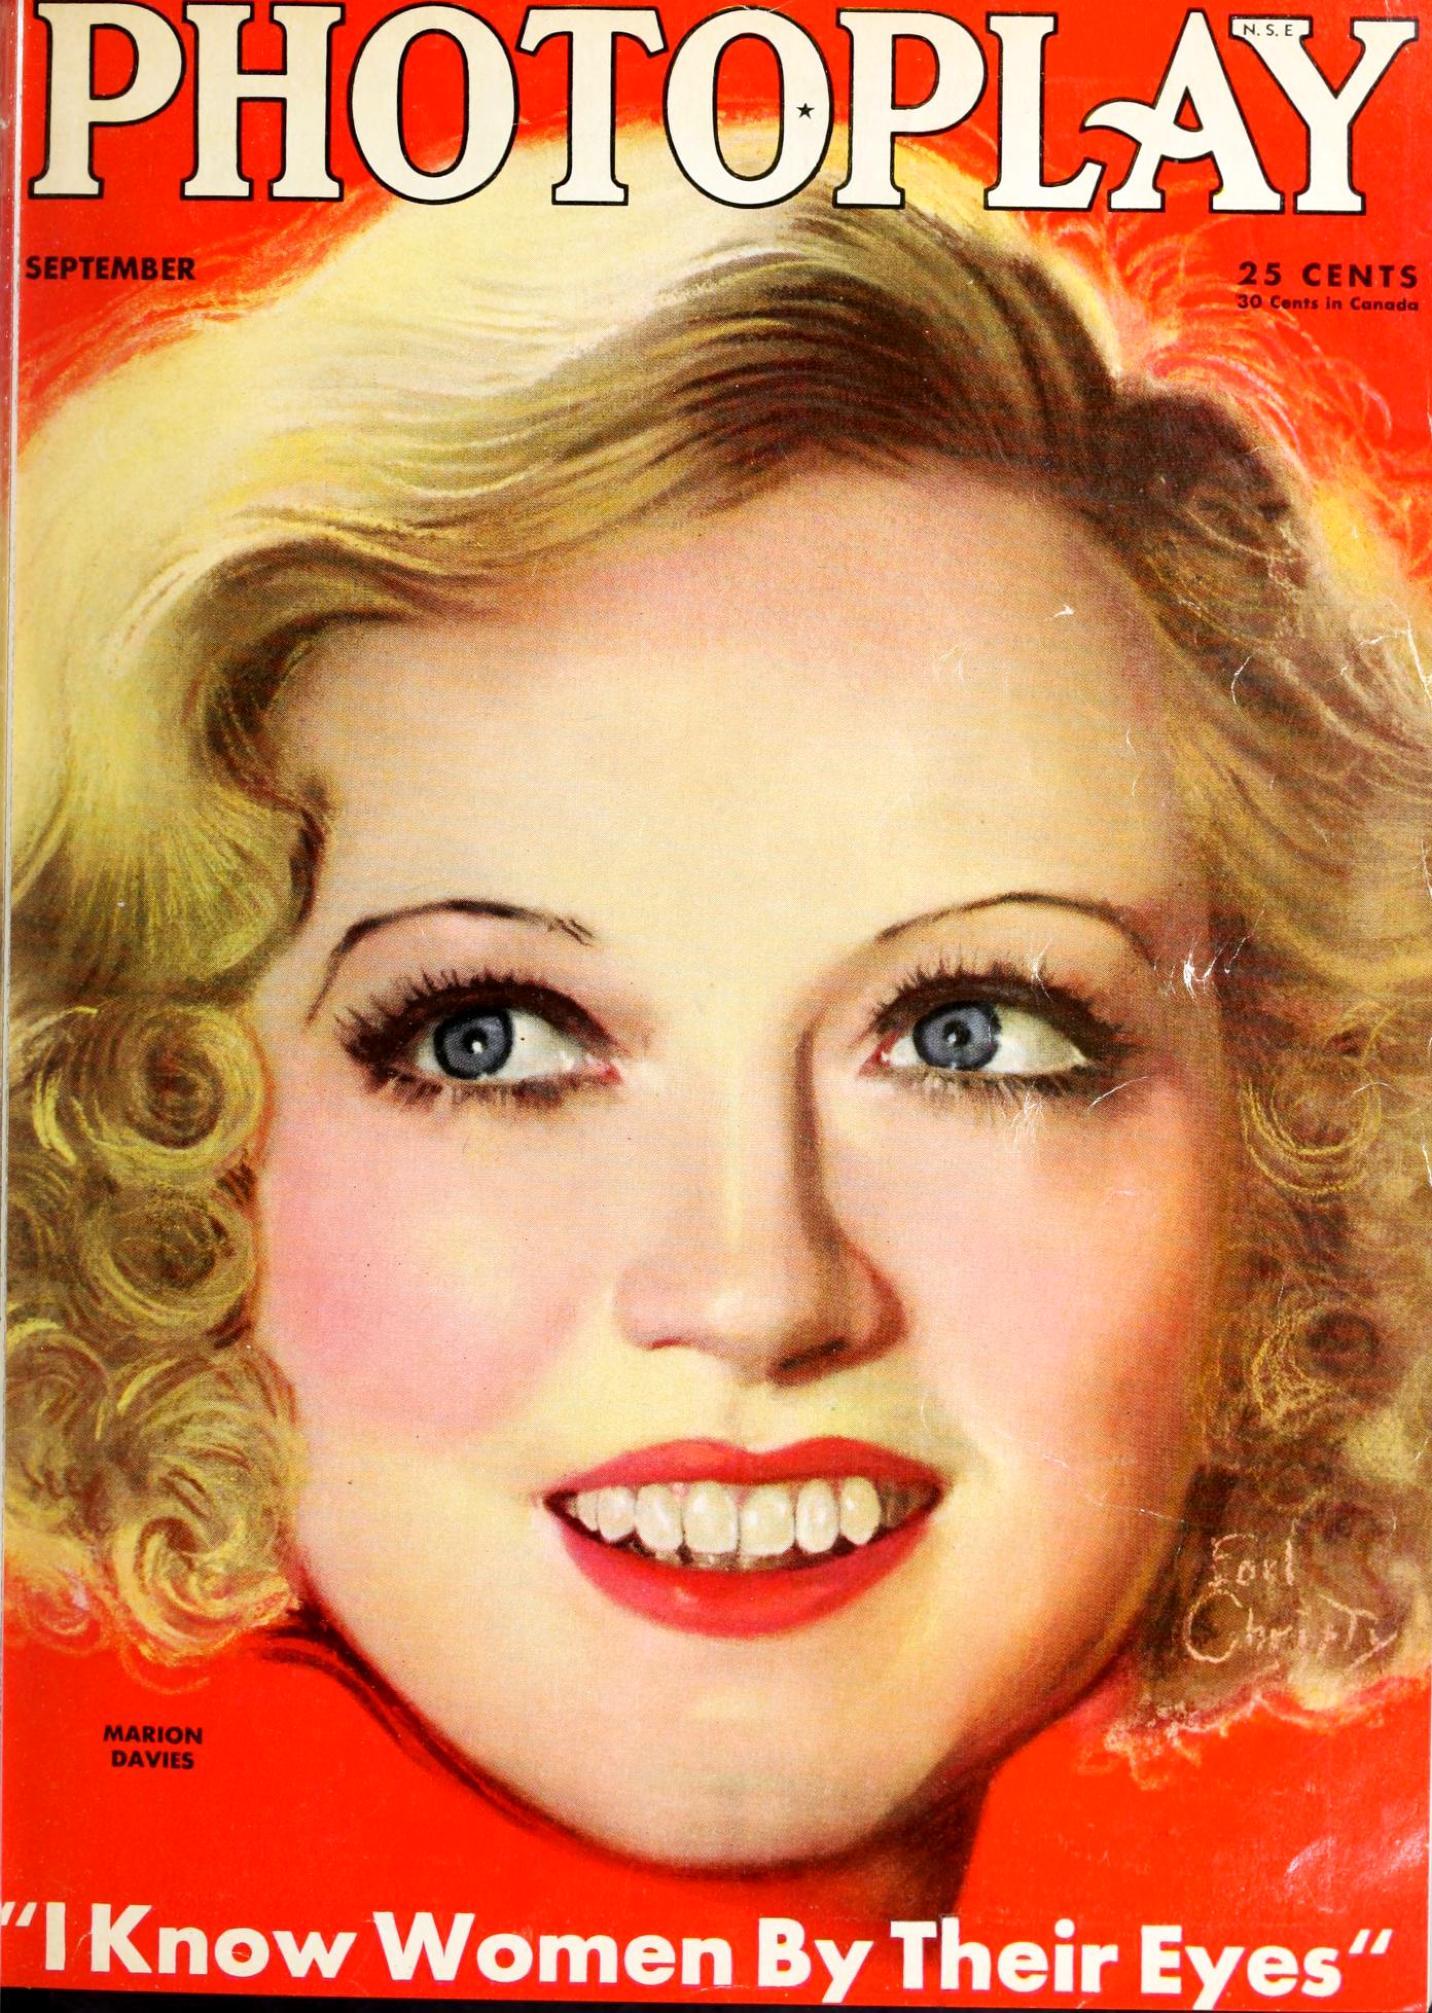 marion davies photoplay september 1933a